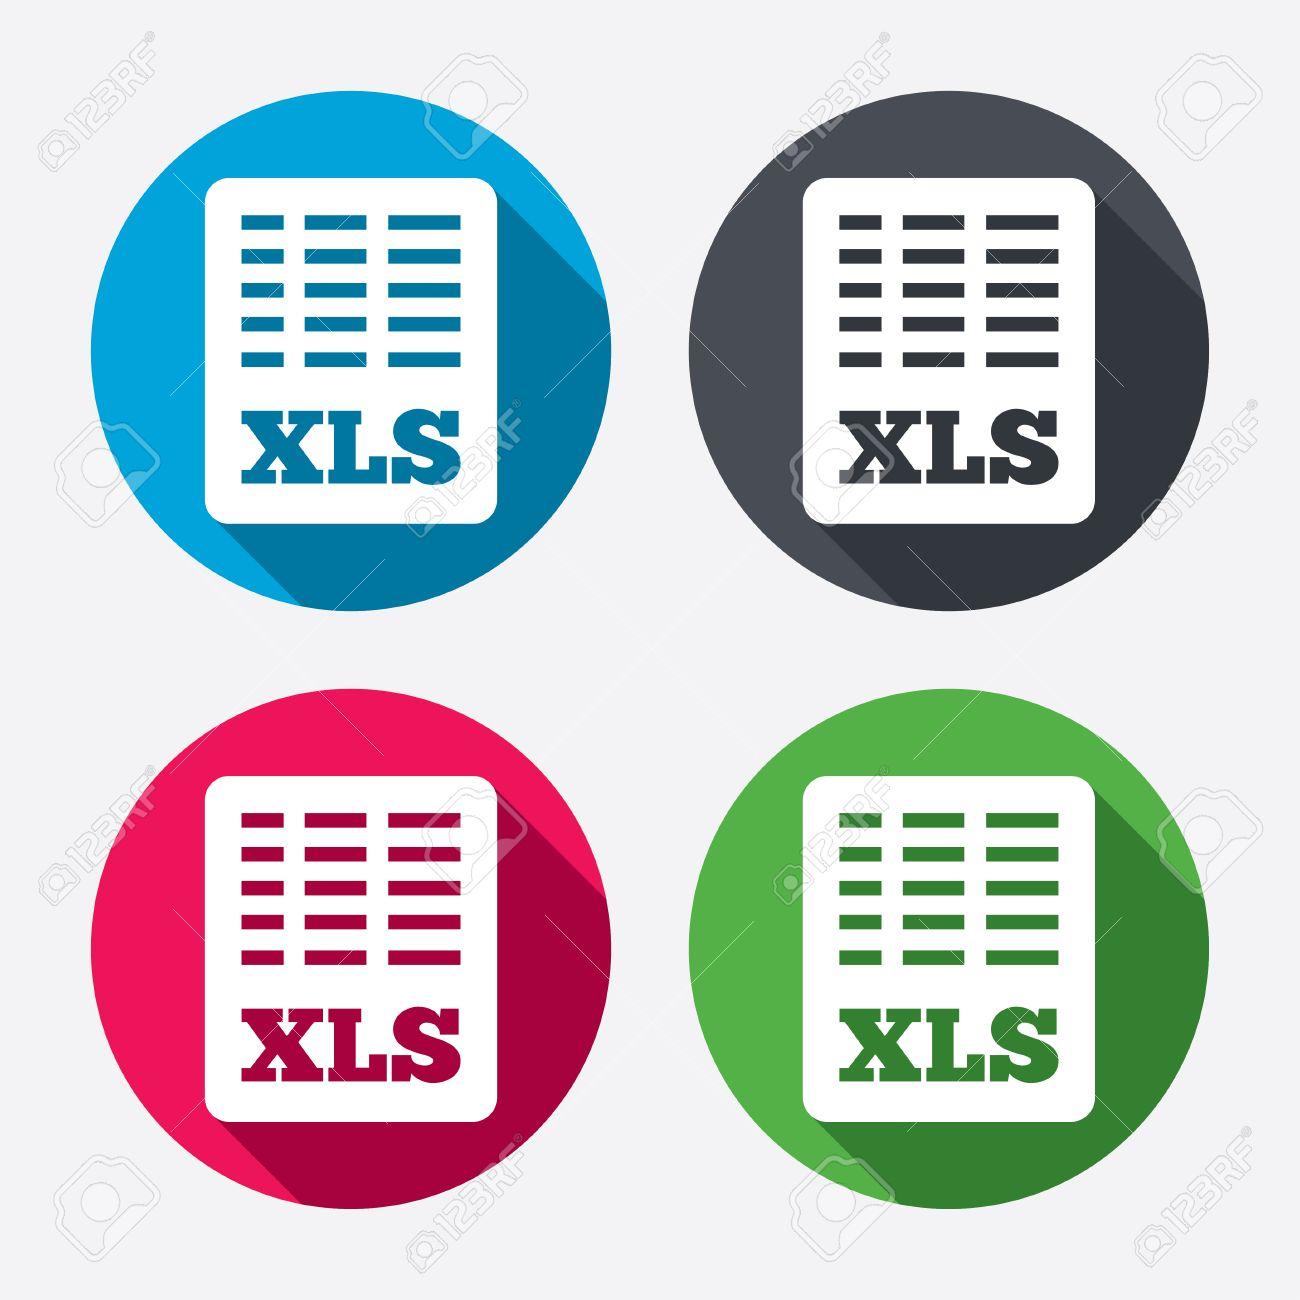 xls файл скачать